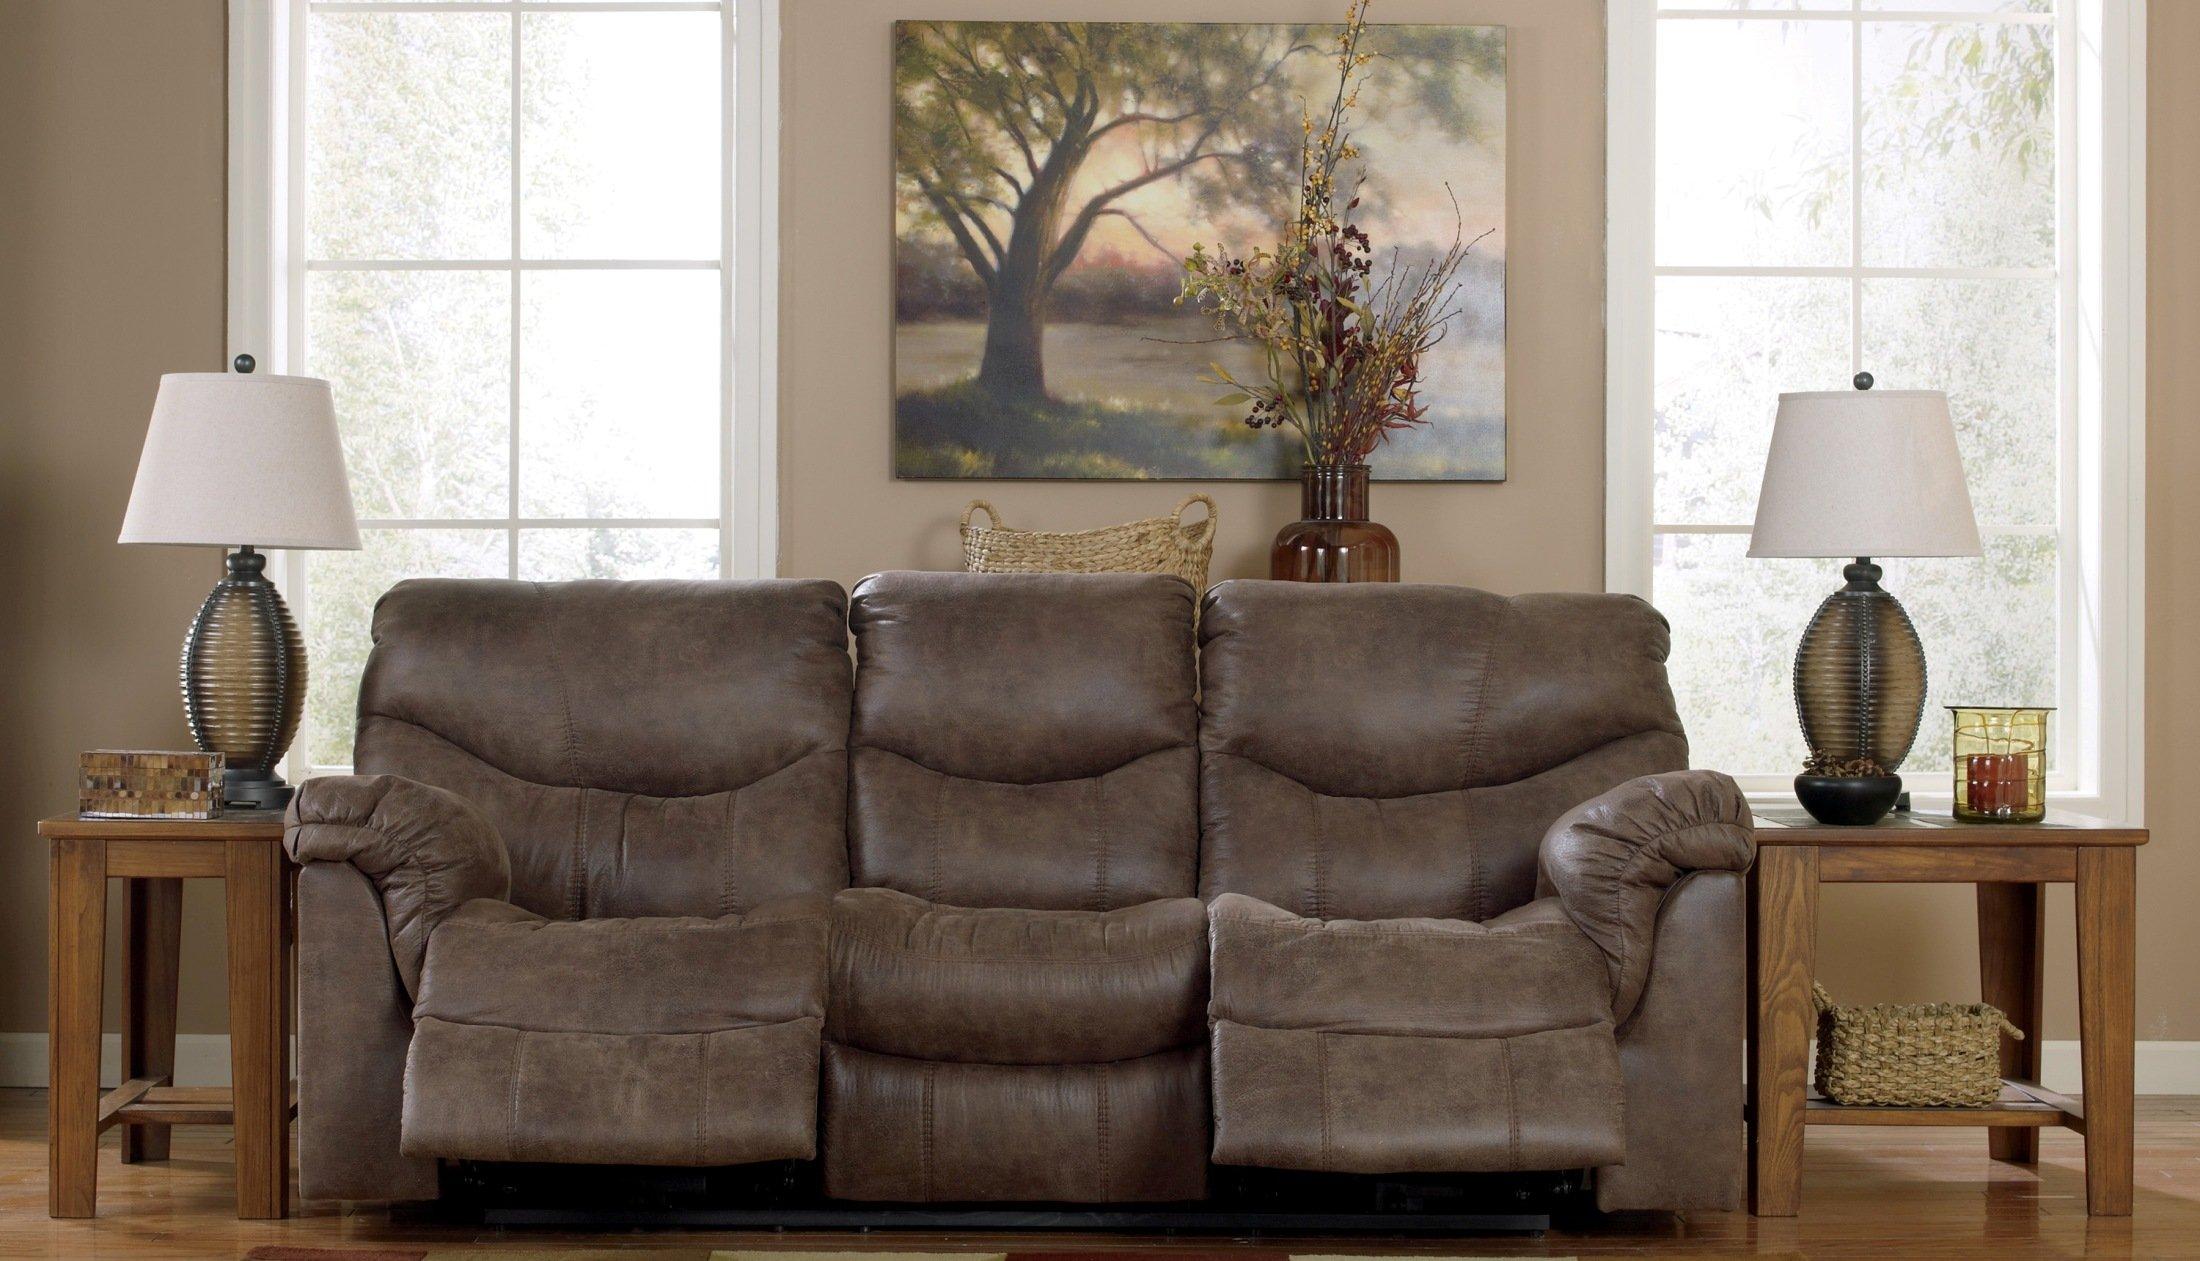 Ashley Furniture Signature Design - Alzena Recliner Sofa - 1 Touch Powered Reclining - Contemporary - Gunsmoke